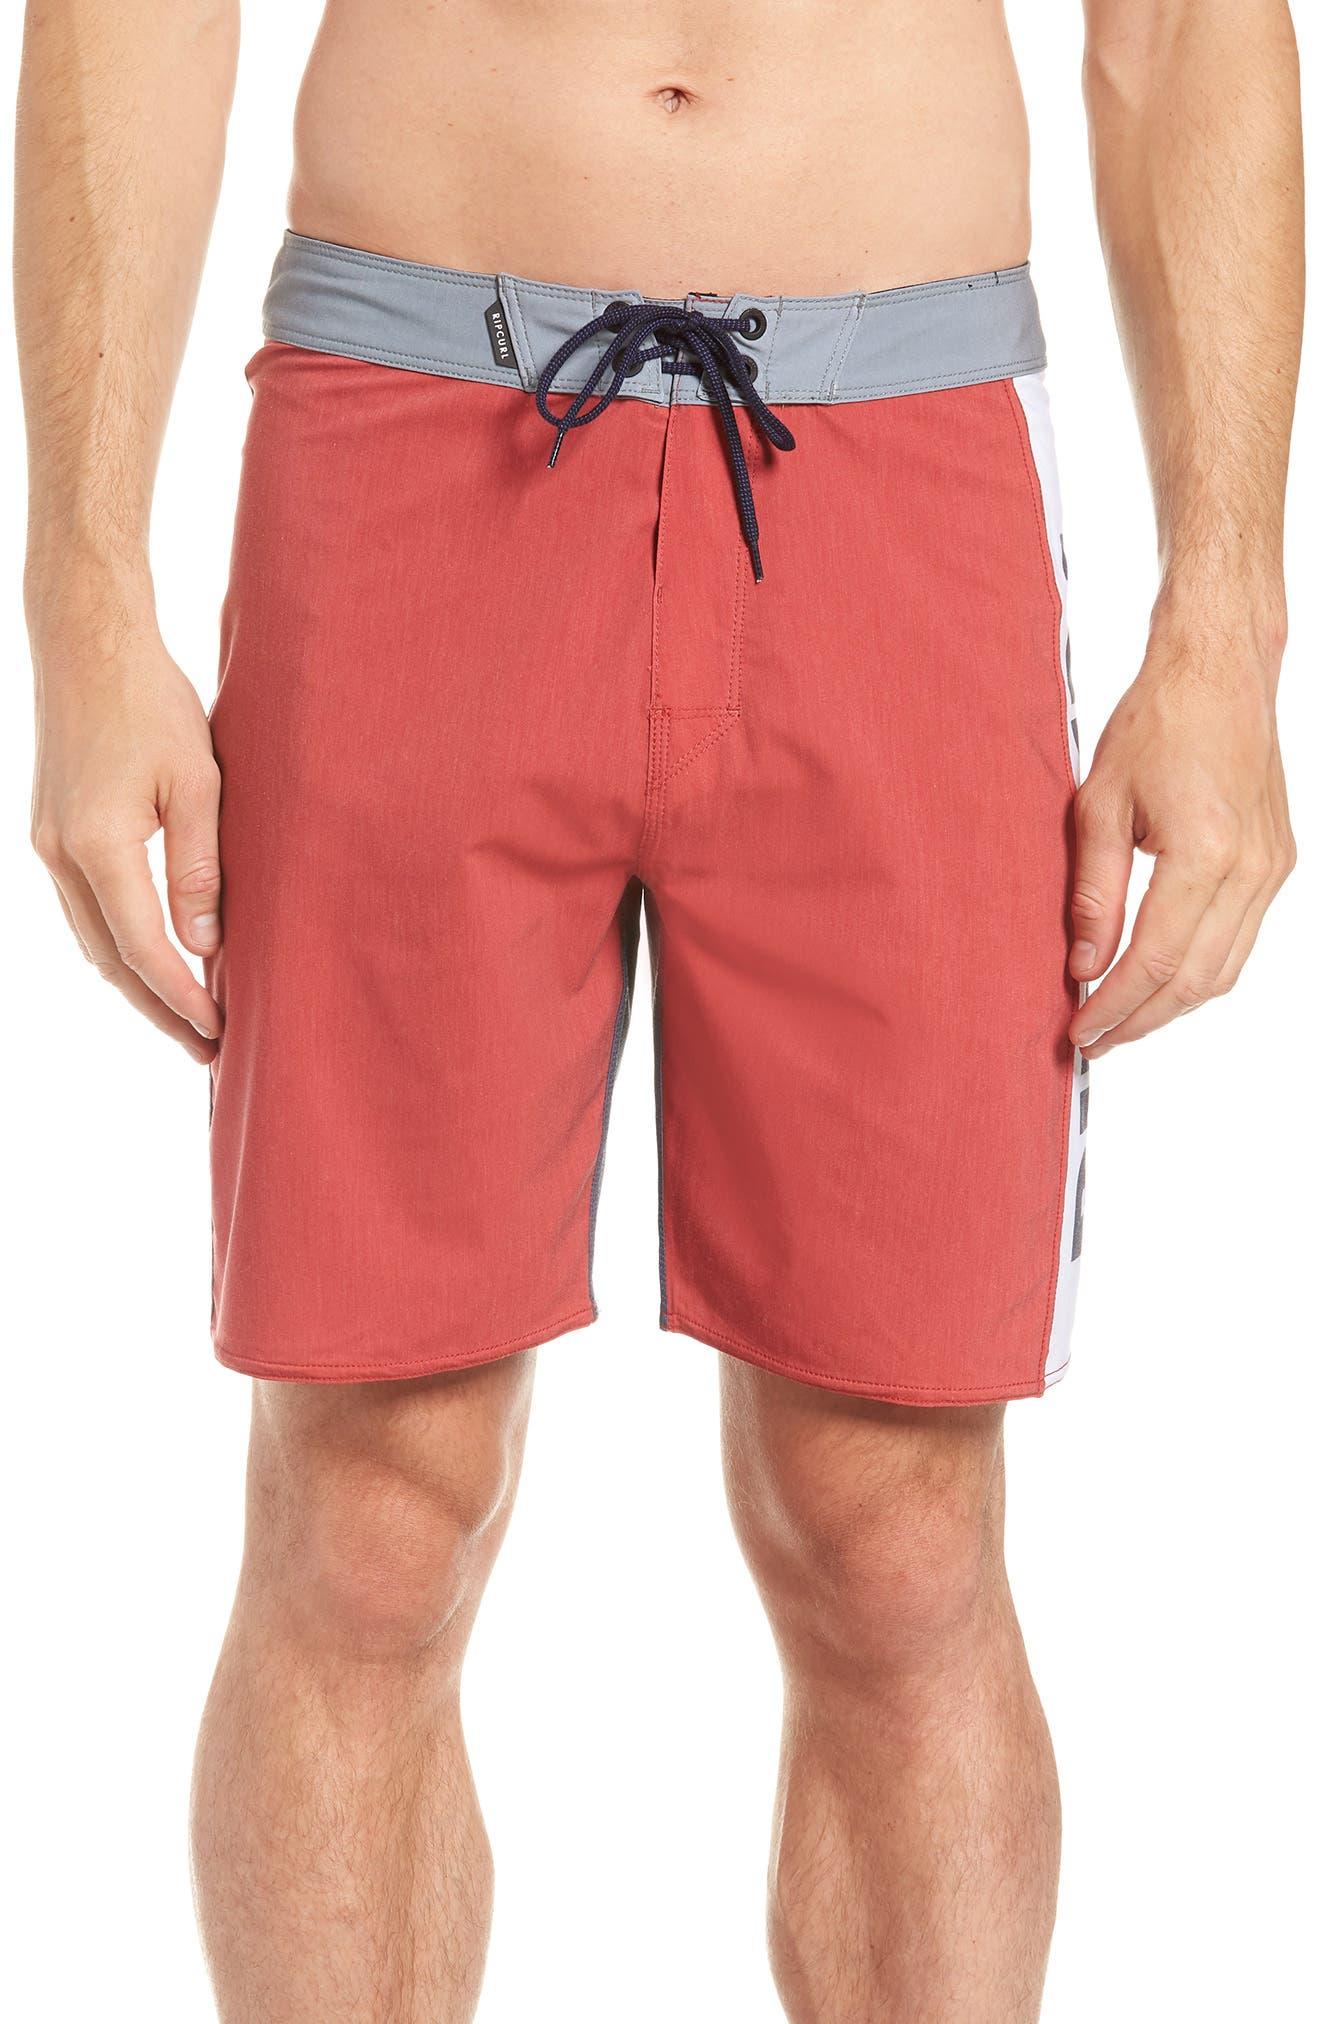 Mirage Owen Stretch Board Shorts,                         Main,                         color, 600